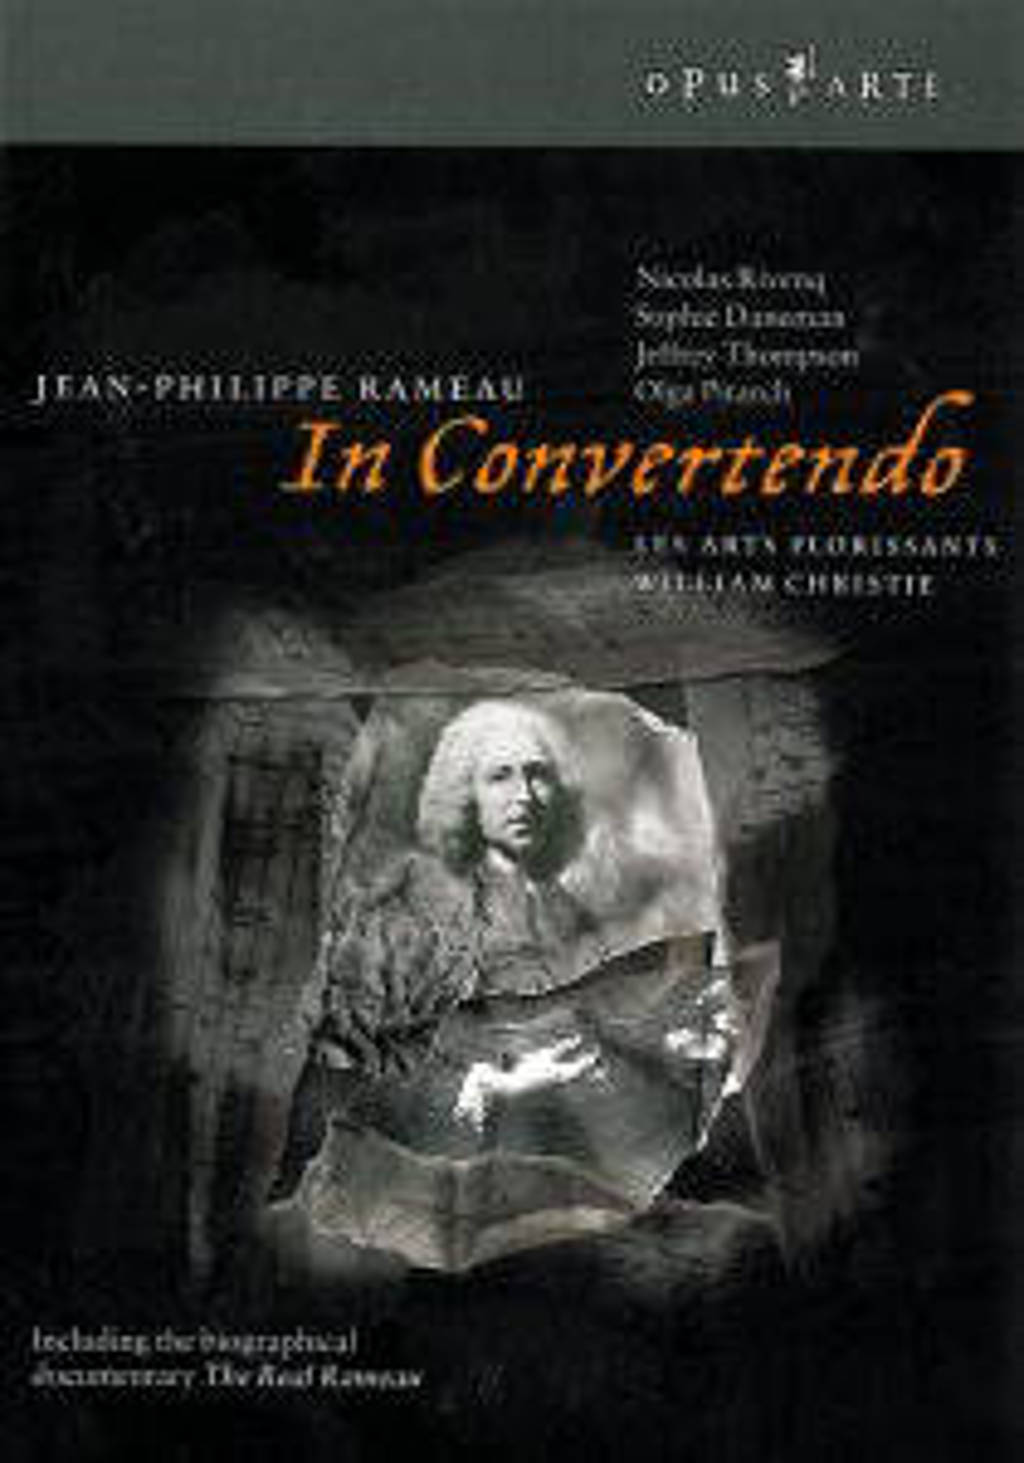 Rivenq/Daneman/Thompson/Les Arts Fl - In Convertendo (DVD)